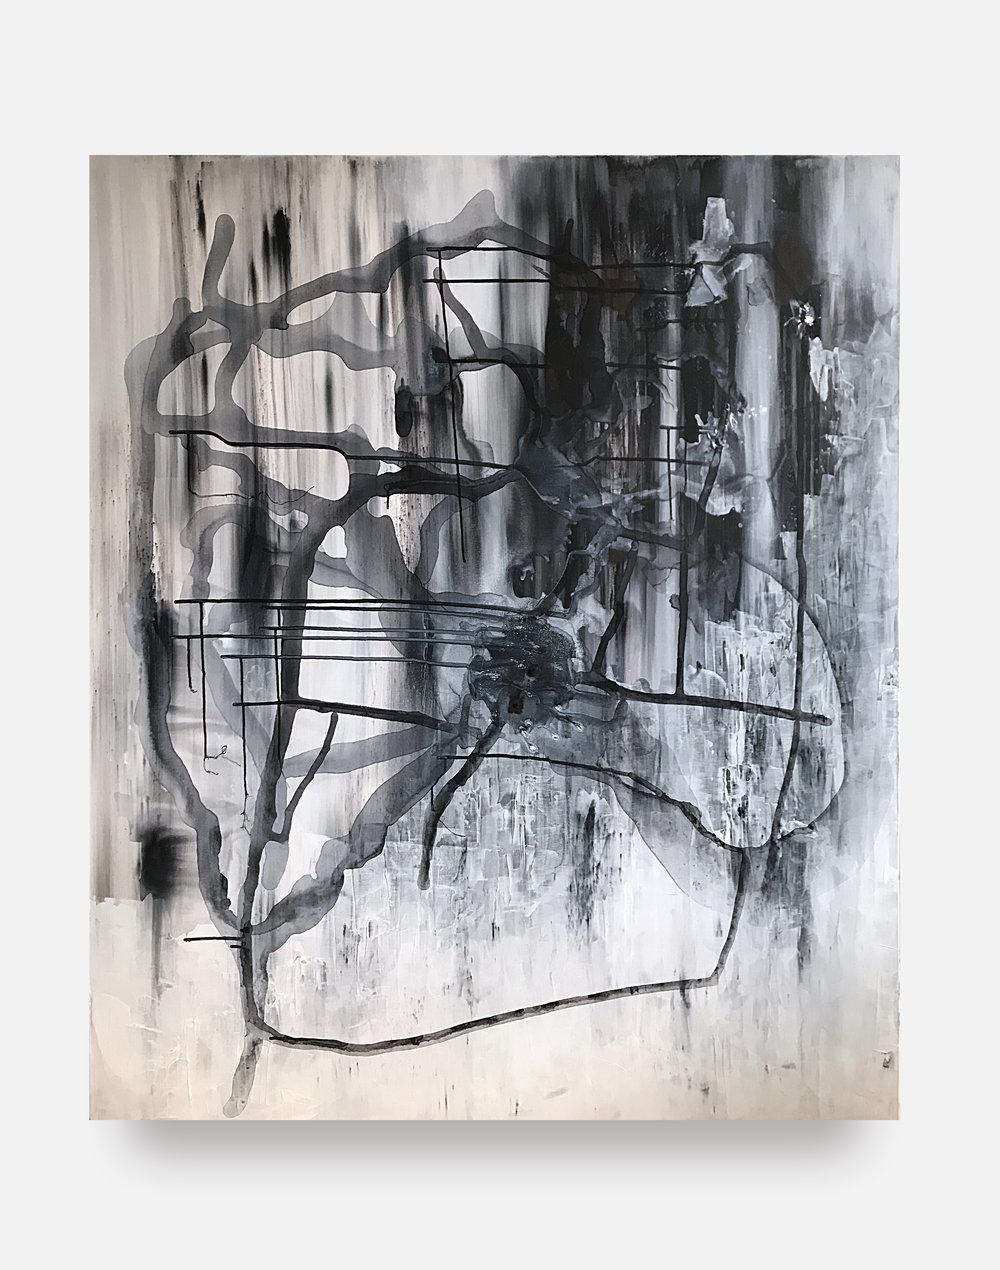 Untitled (collaboration), 2018